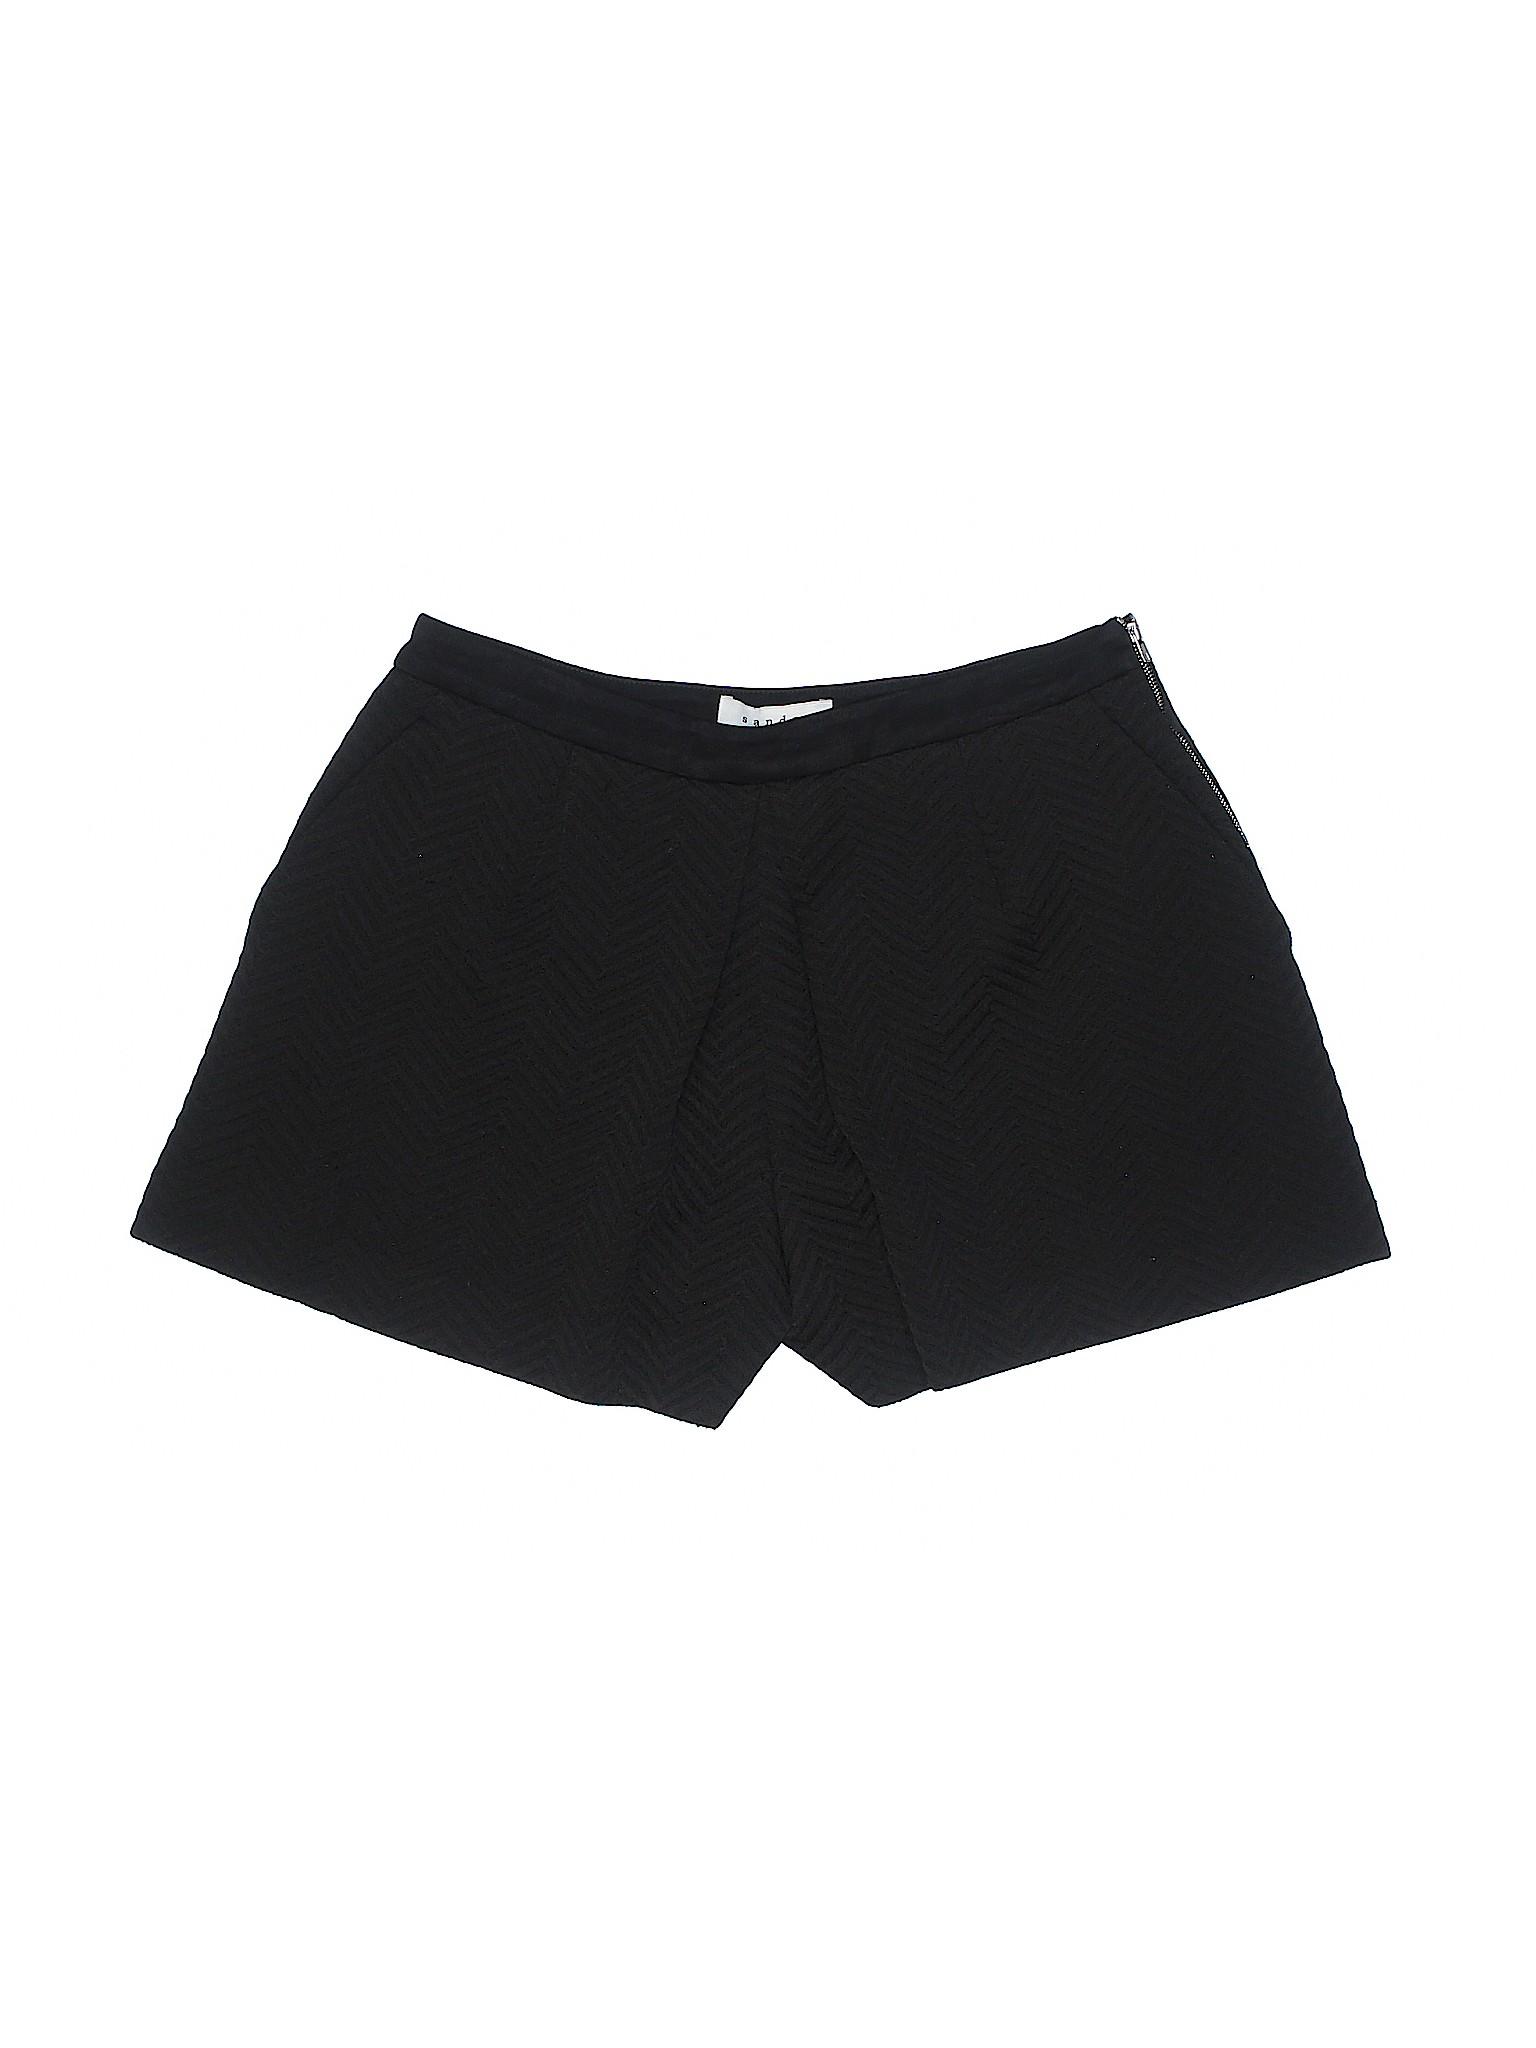 Shorts Boutique leisure Dressy Sandro Boutique leisure H7WnXX